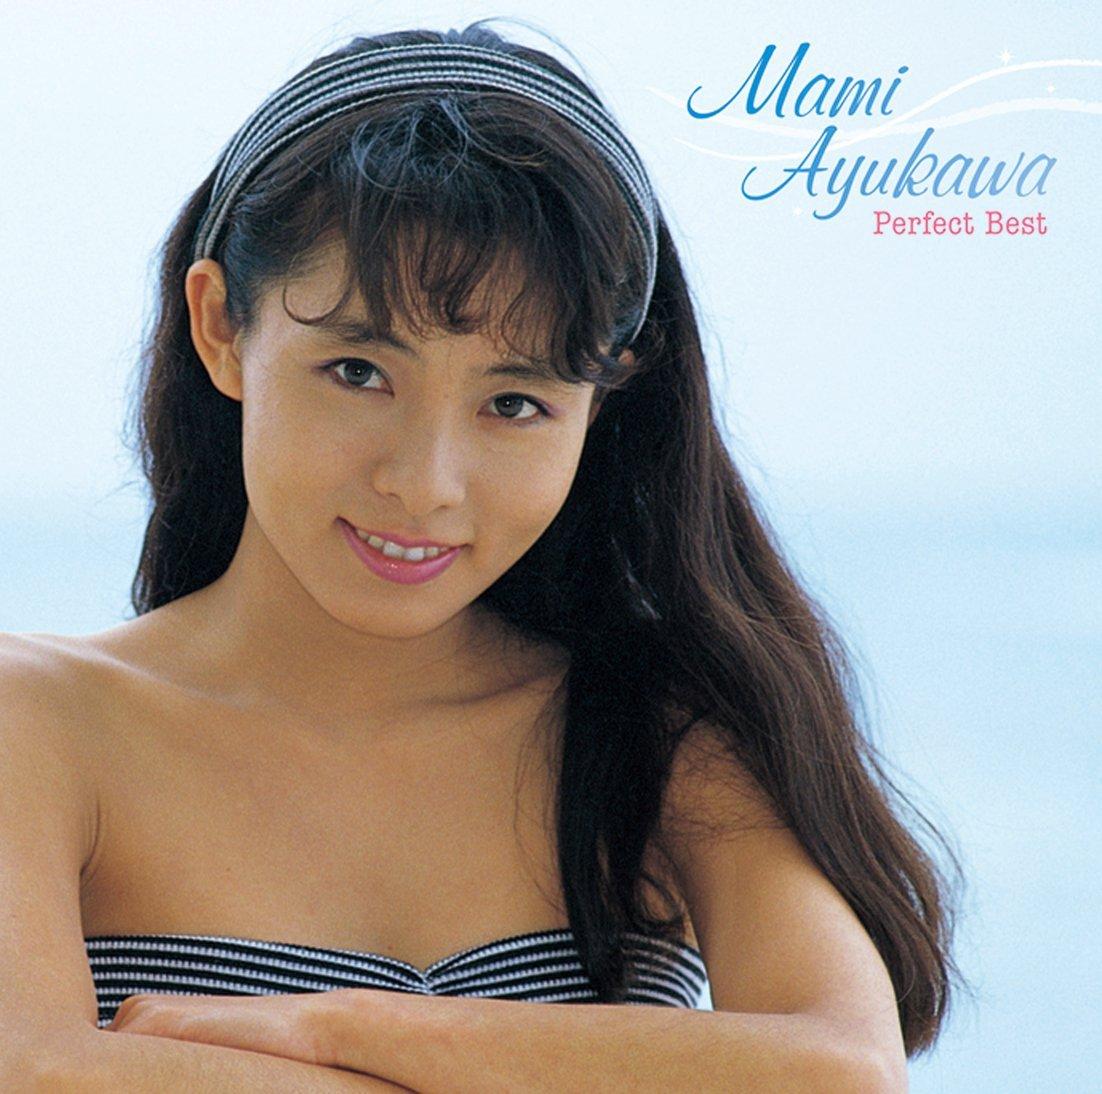 20161018.22.12 Mami Ayukawa - Perfect Best cover.jpg